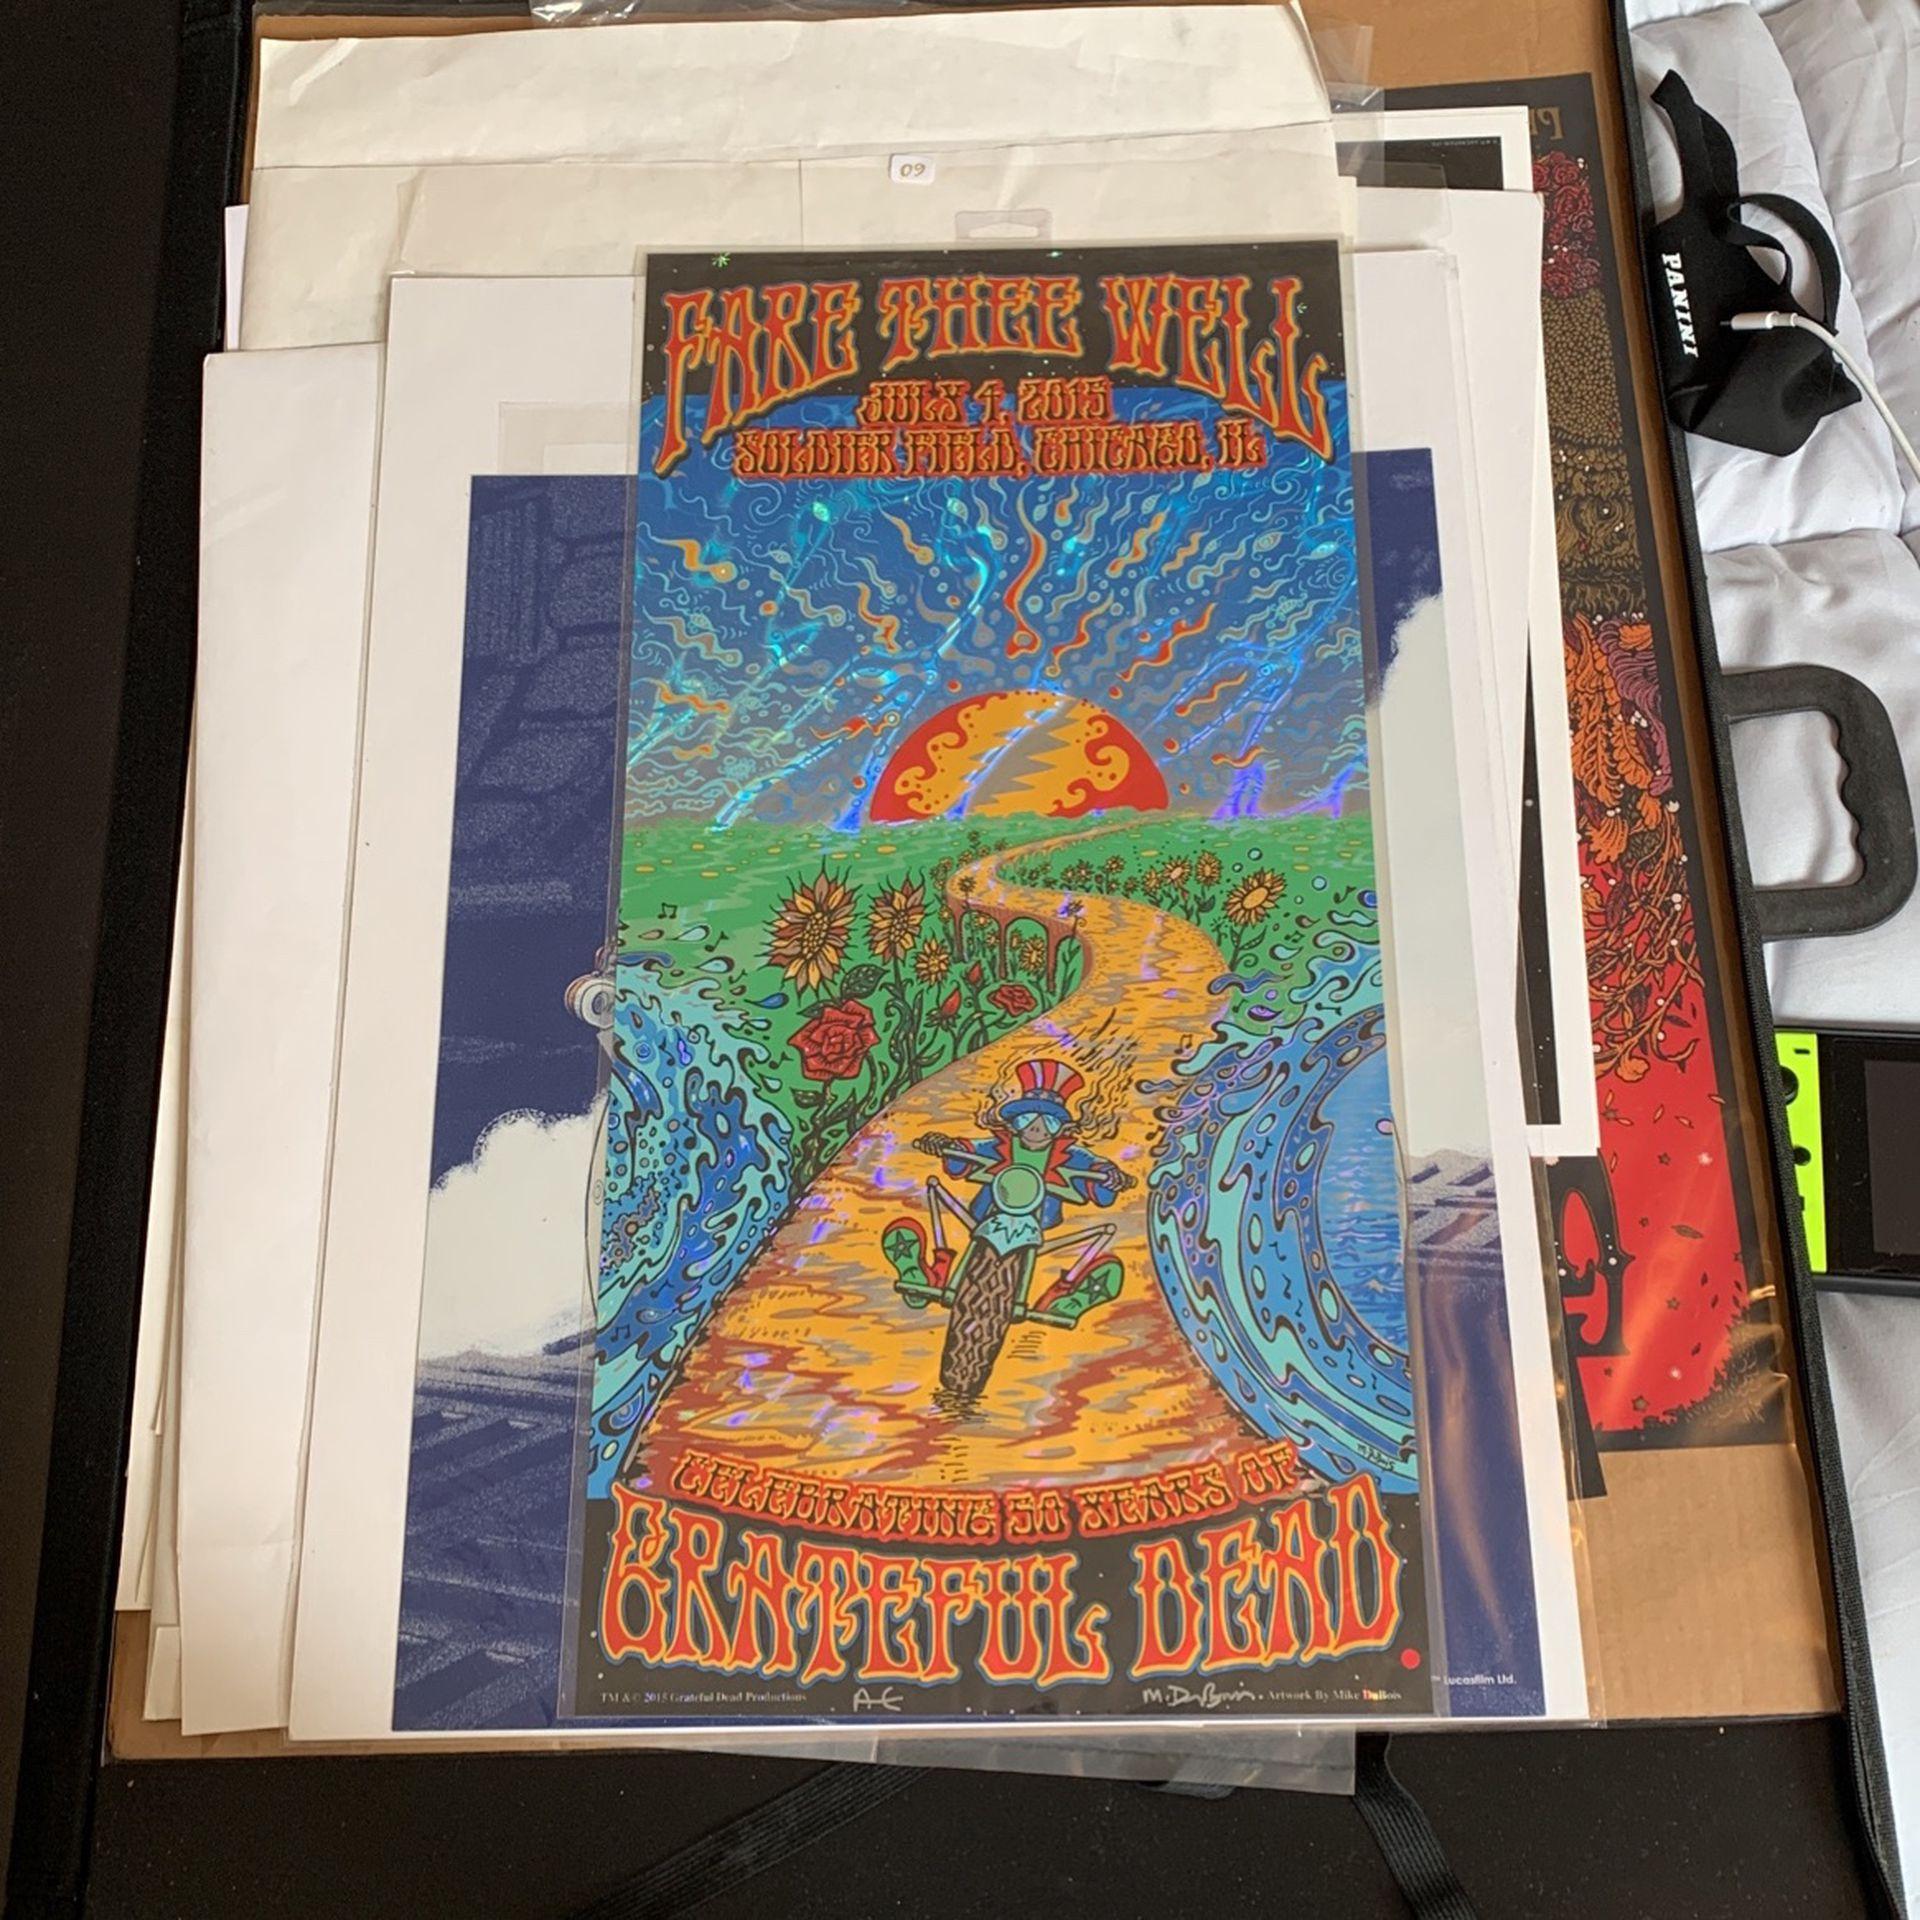 Original LAVA FOIL silkscreen concert poster for The